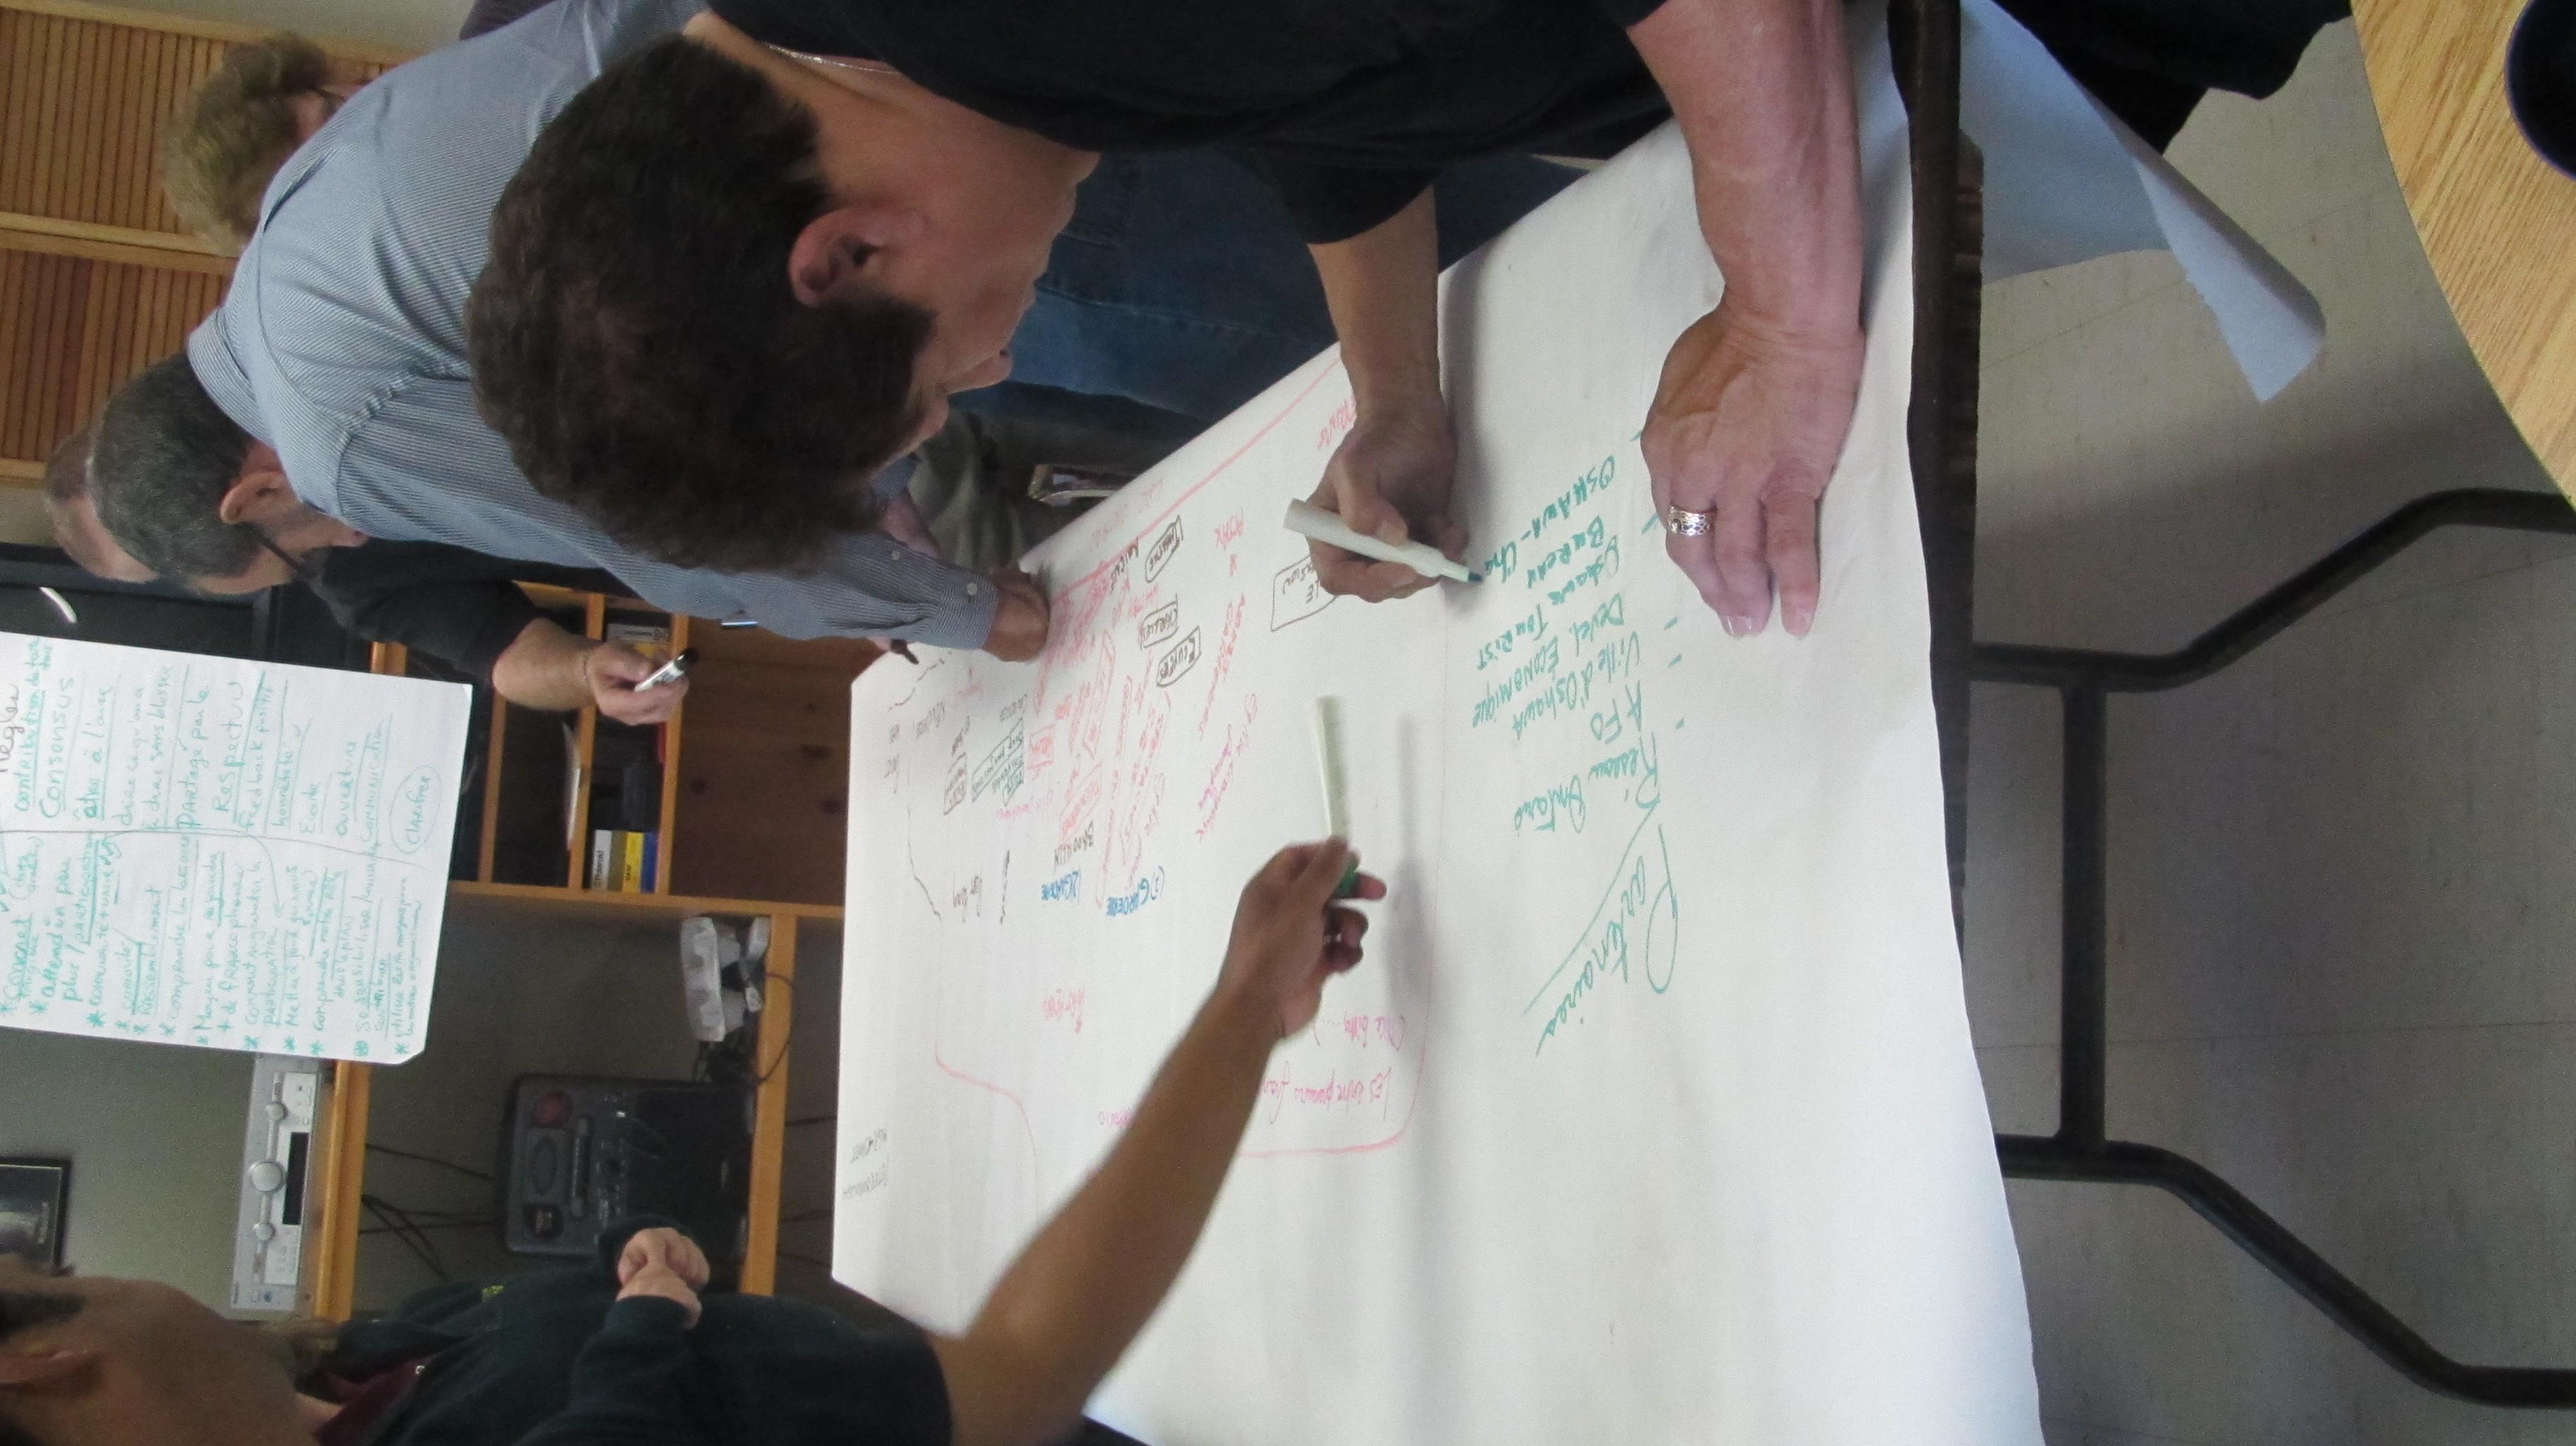 Planification communautaire